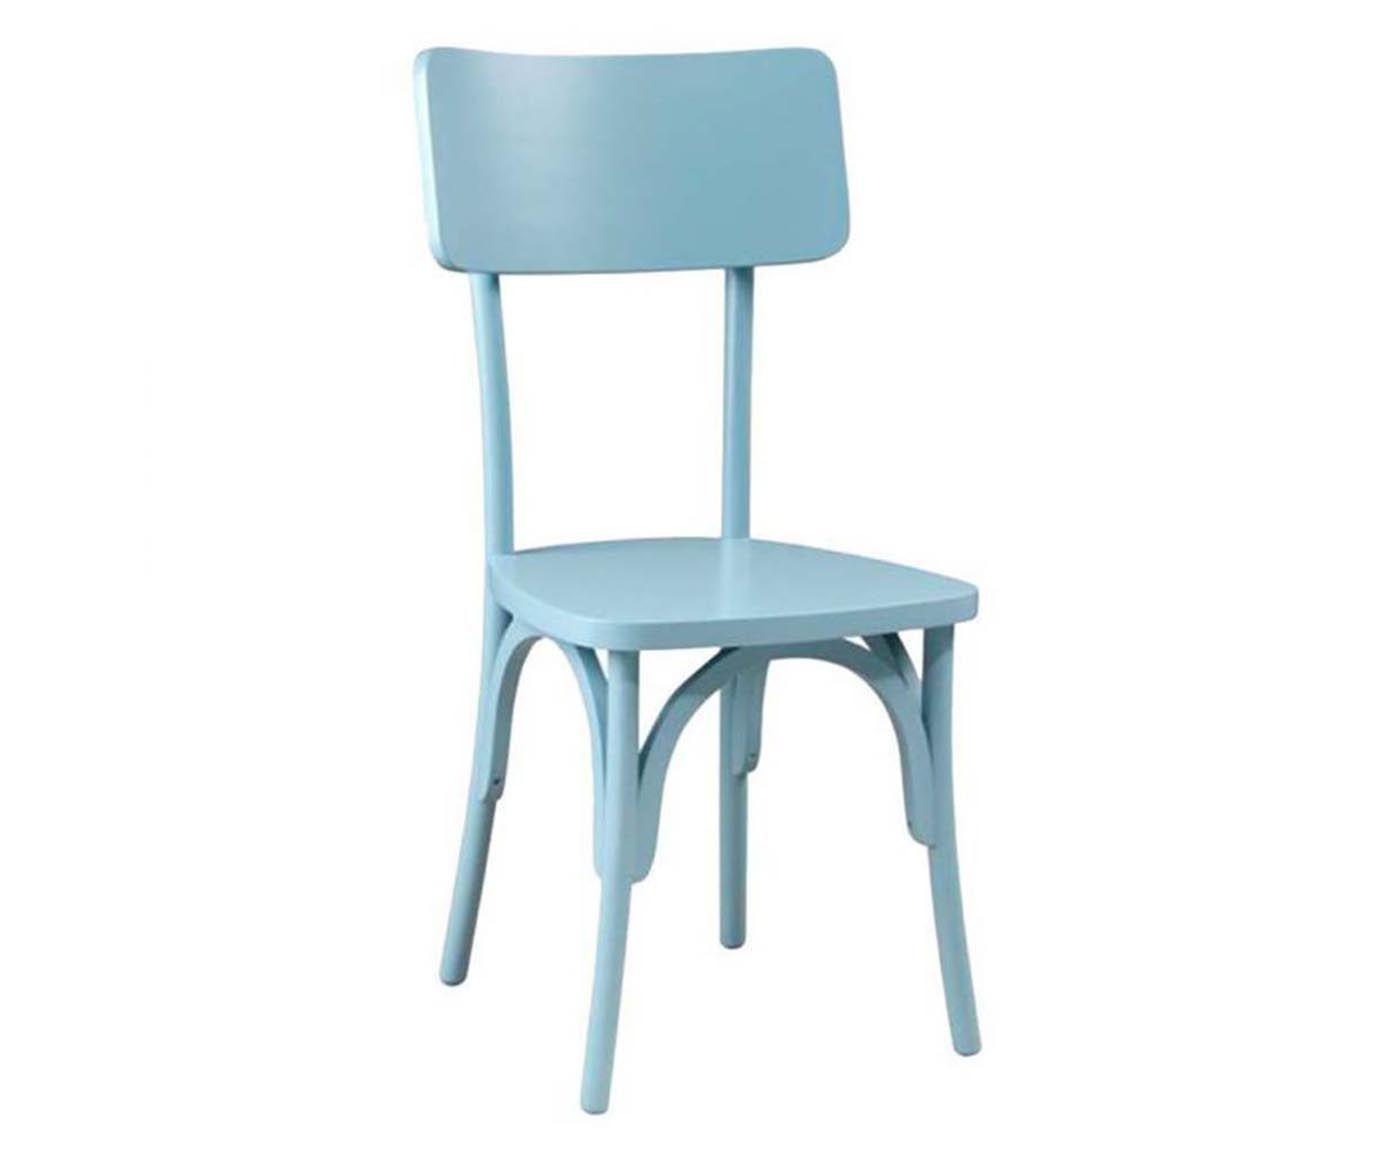 Cadeira romarin square - zen | Westwing.com.br